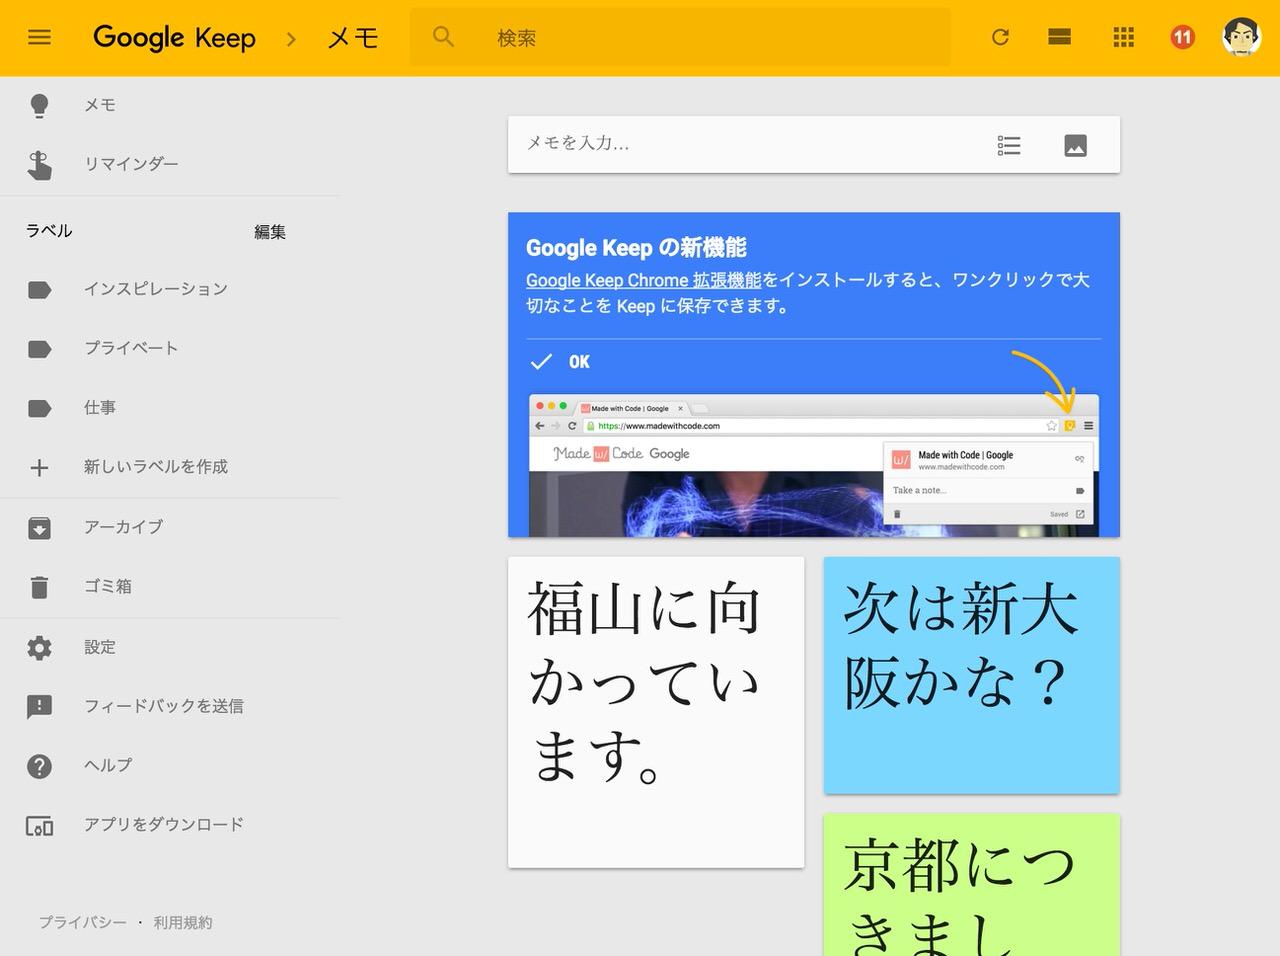 「Google Keep」メモの自動分類機能が追加